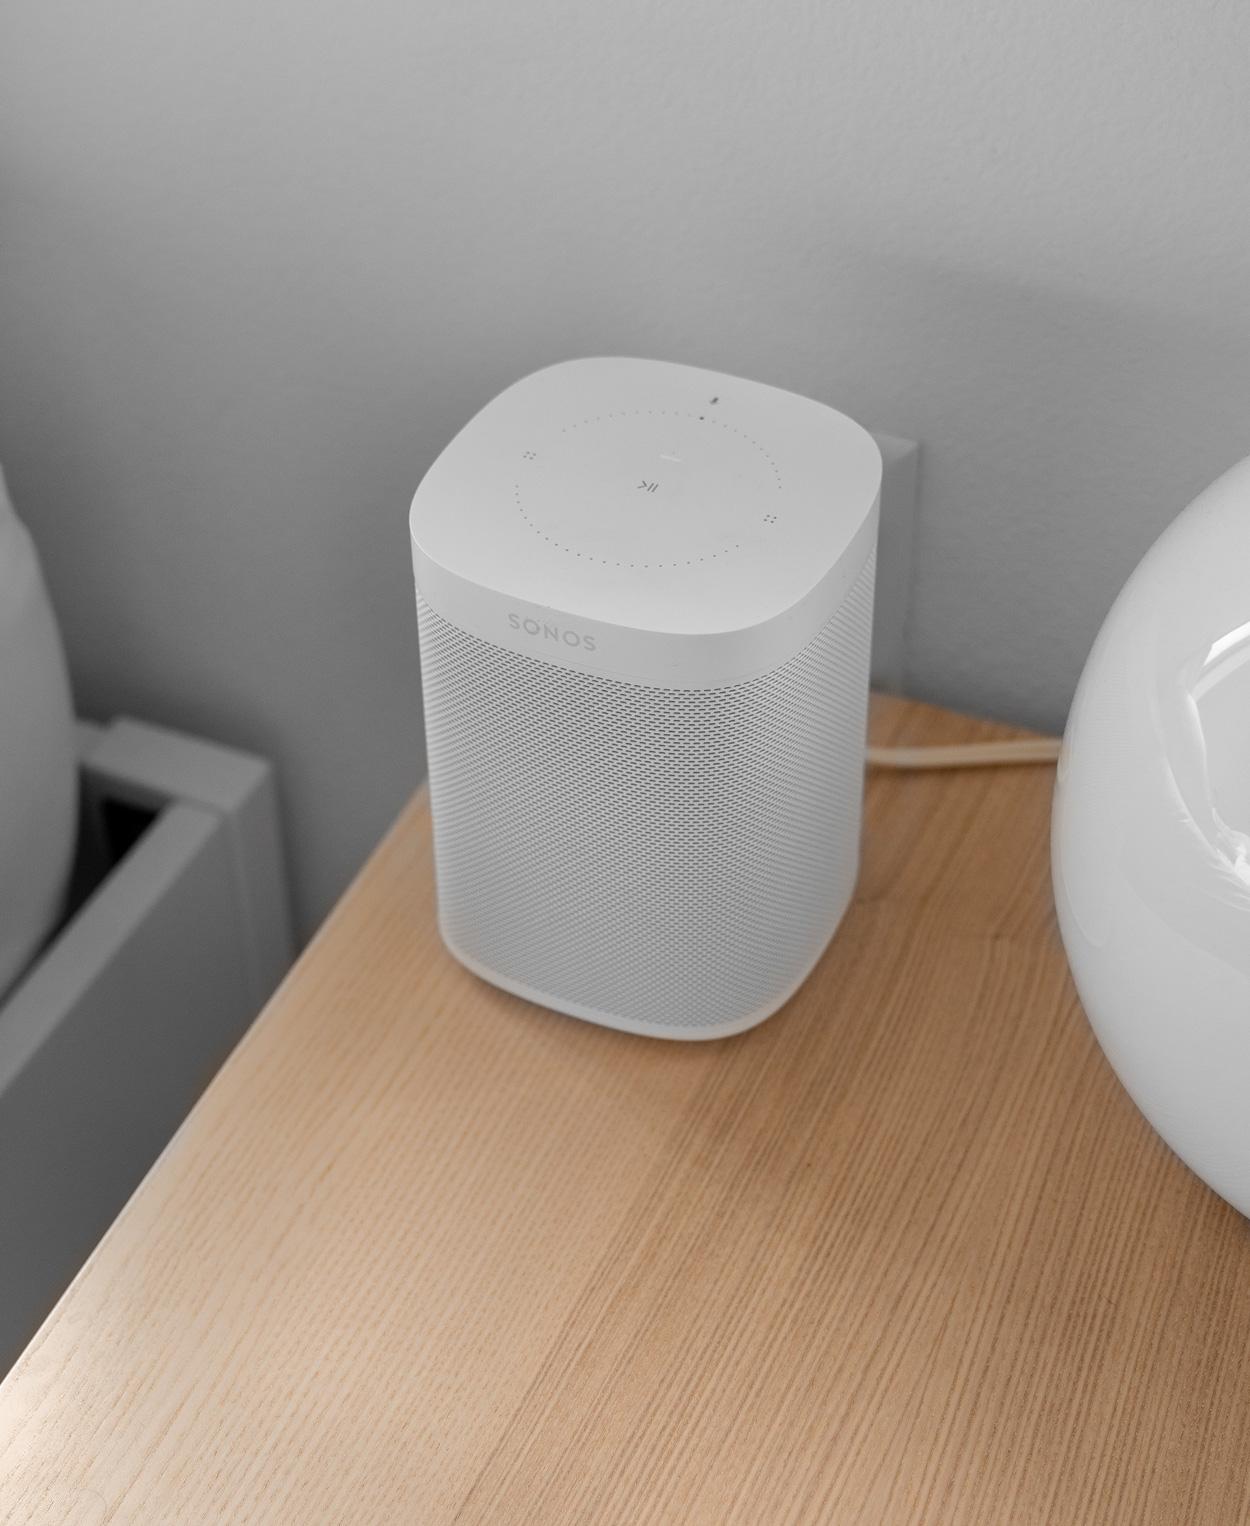 Via een smart home systeem, bedien je je lampen via je stem.